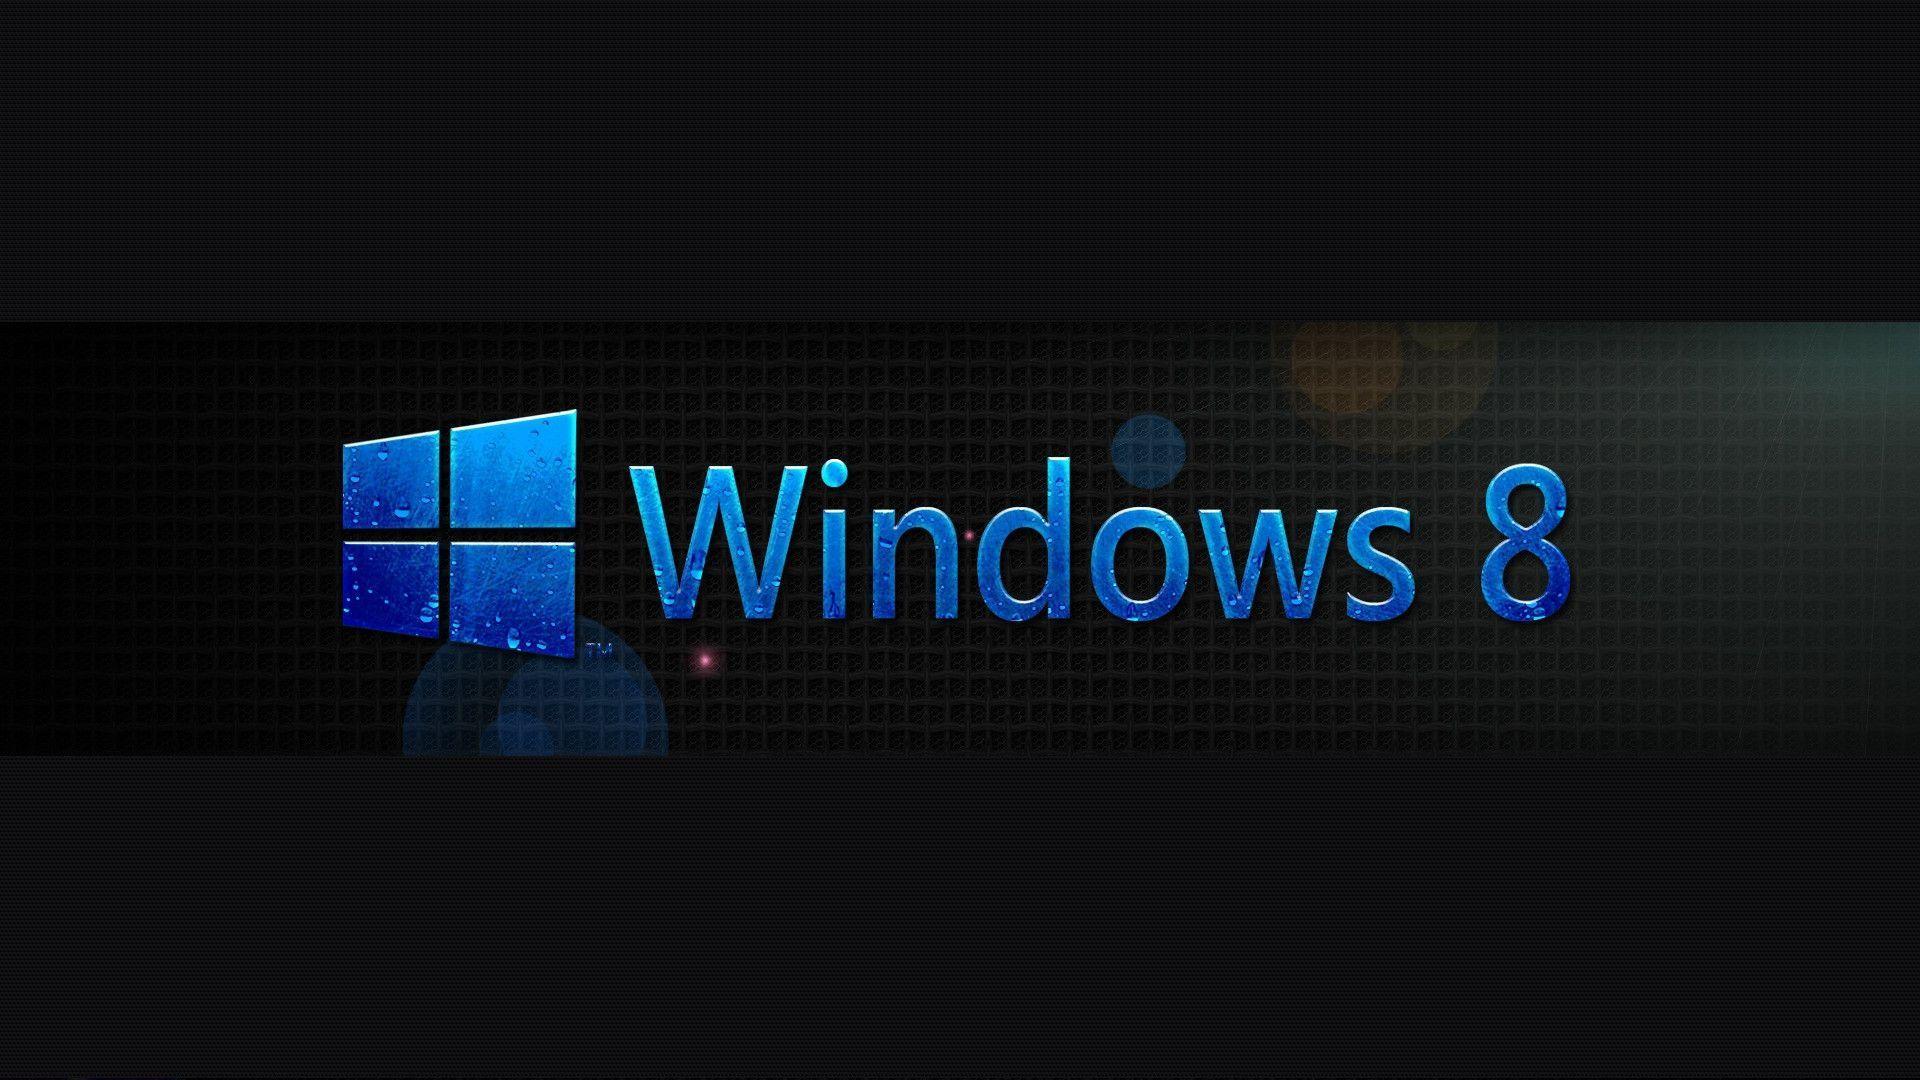 Windows 8 wallpapers hd wallpaper cave - Windows 8 1 wallpaper hd nature ...